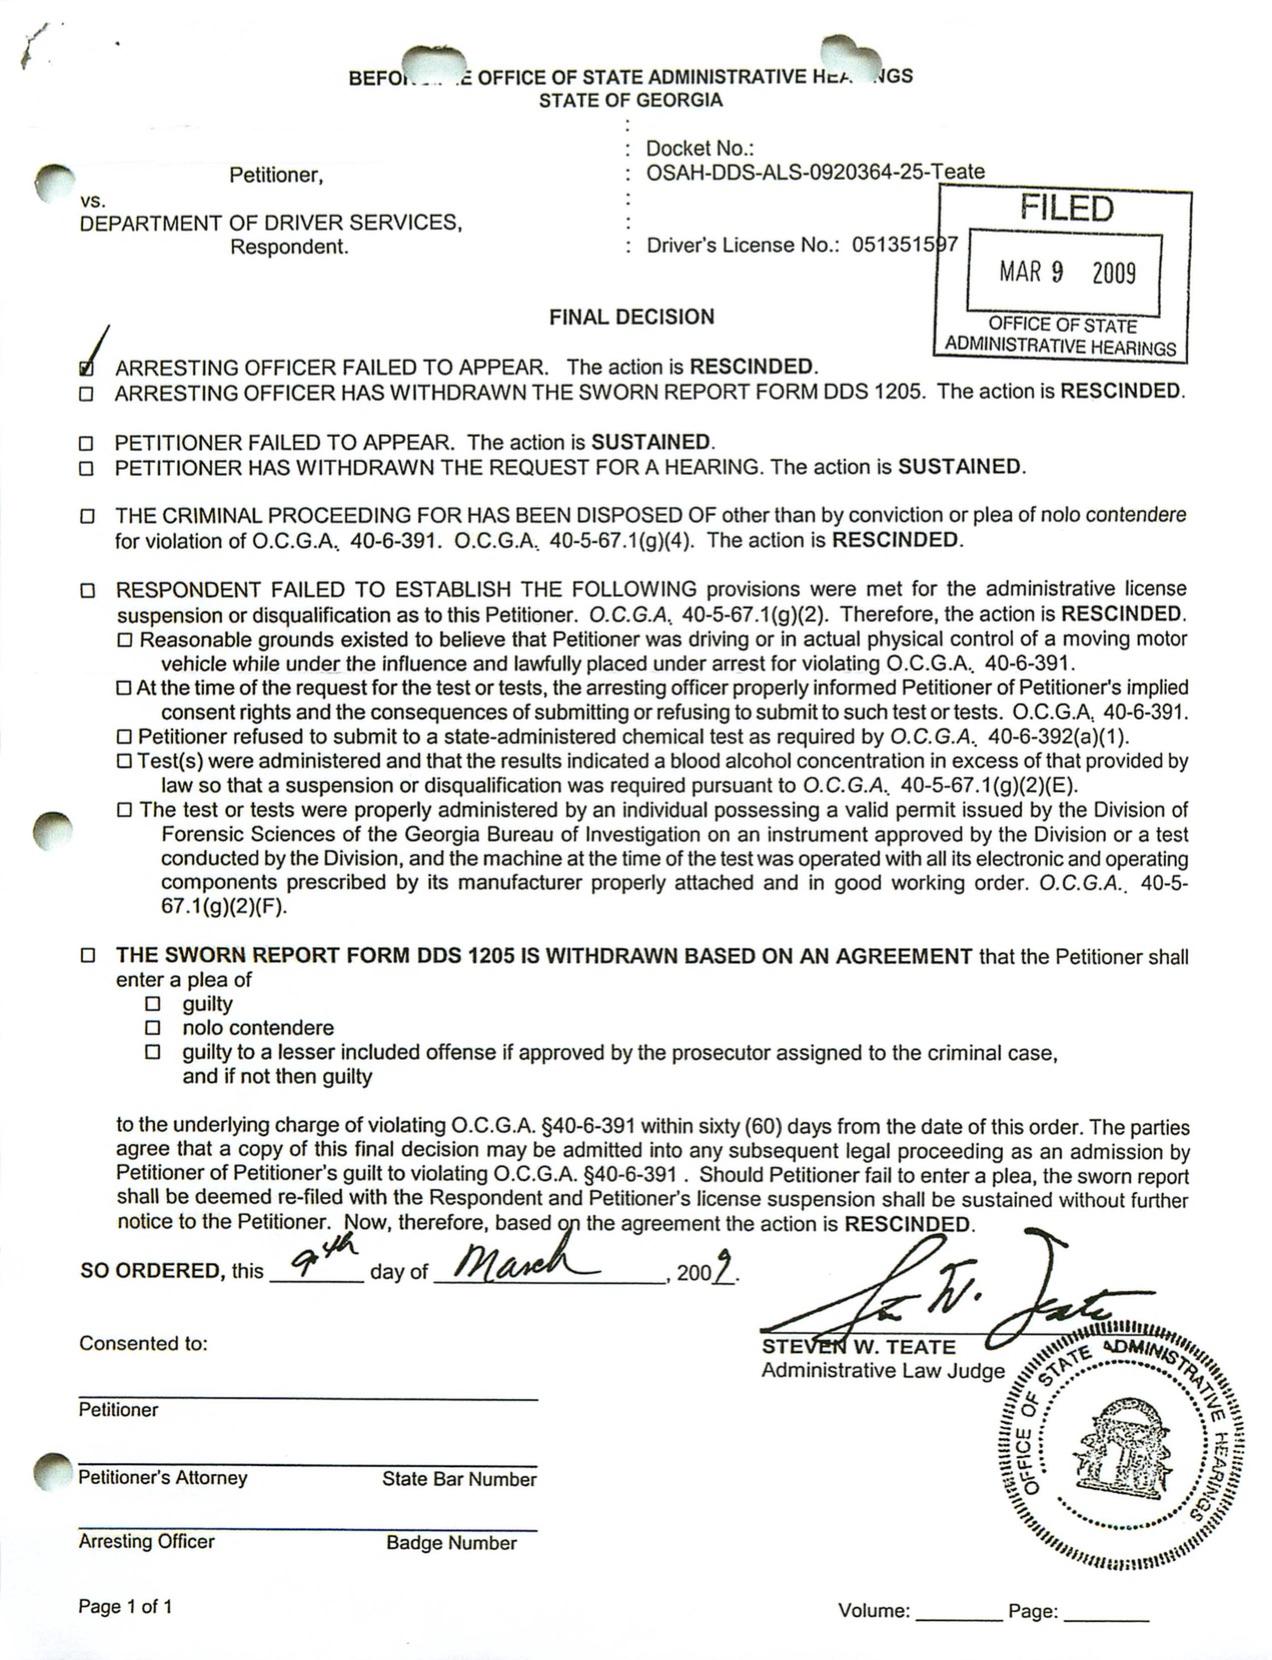 georgia dui license suspension test refusal